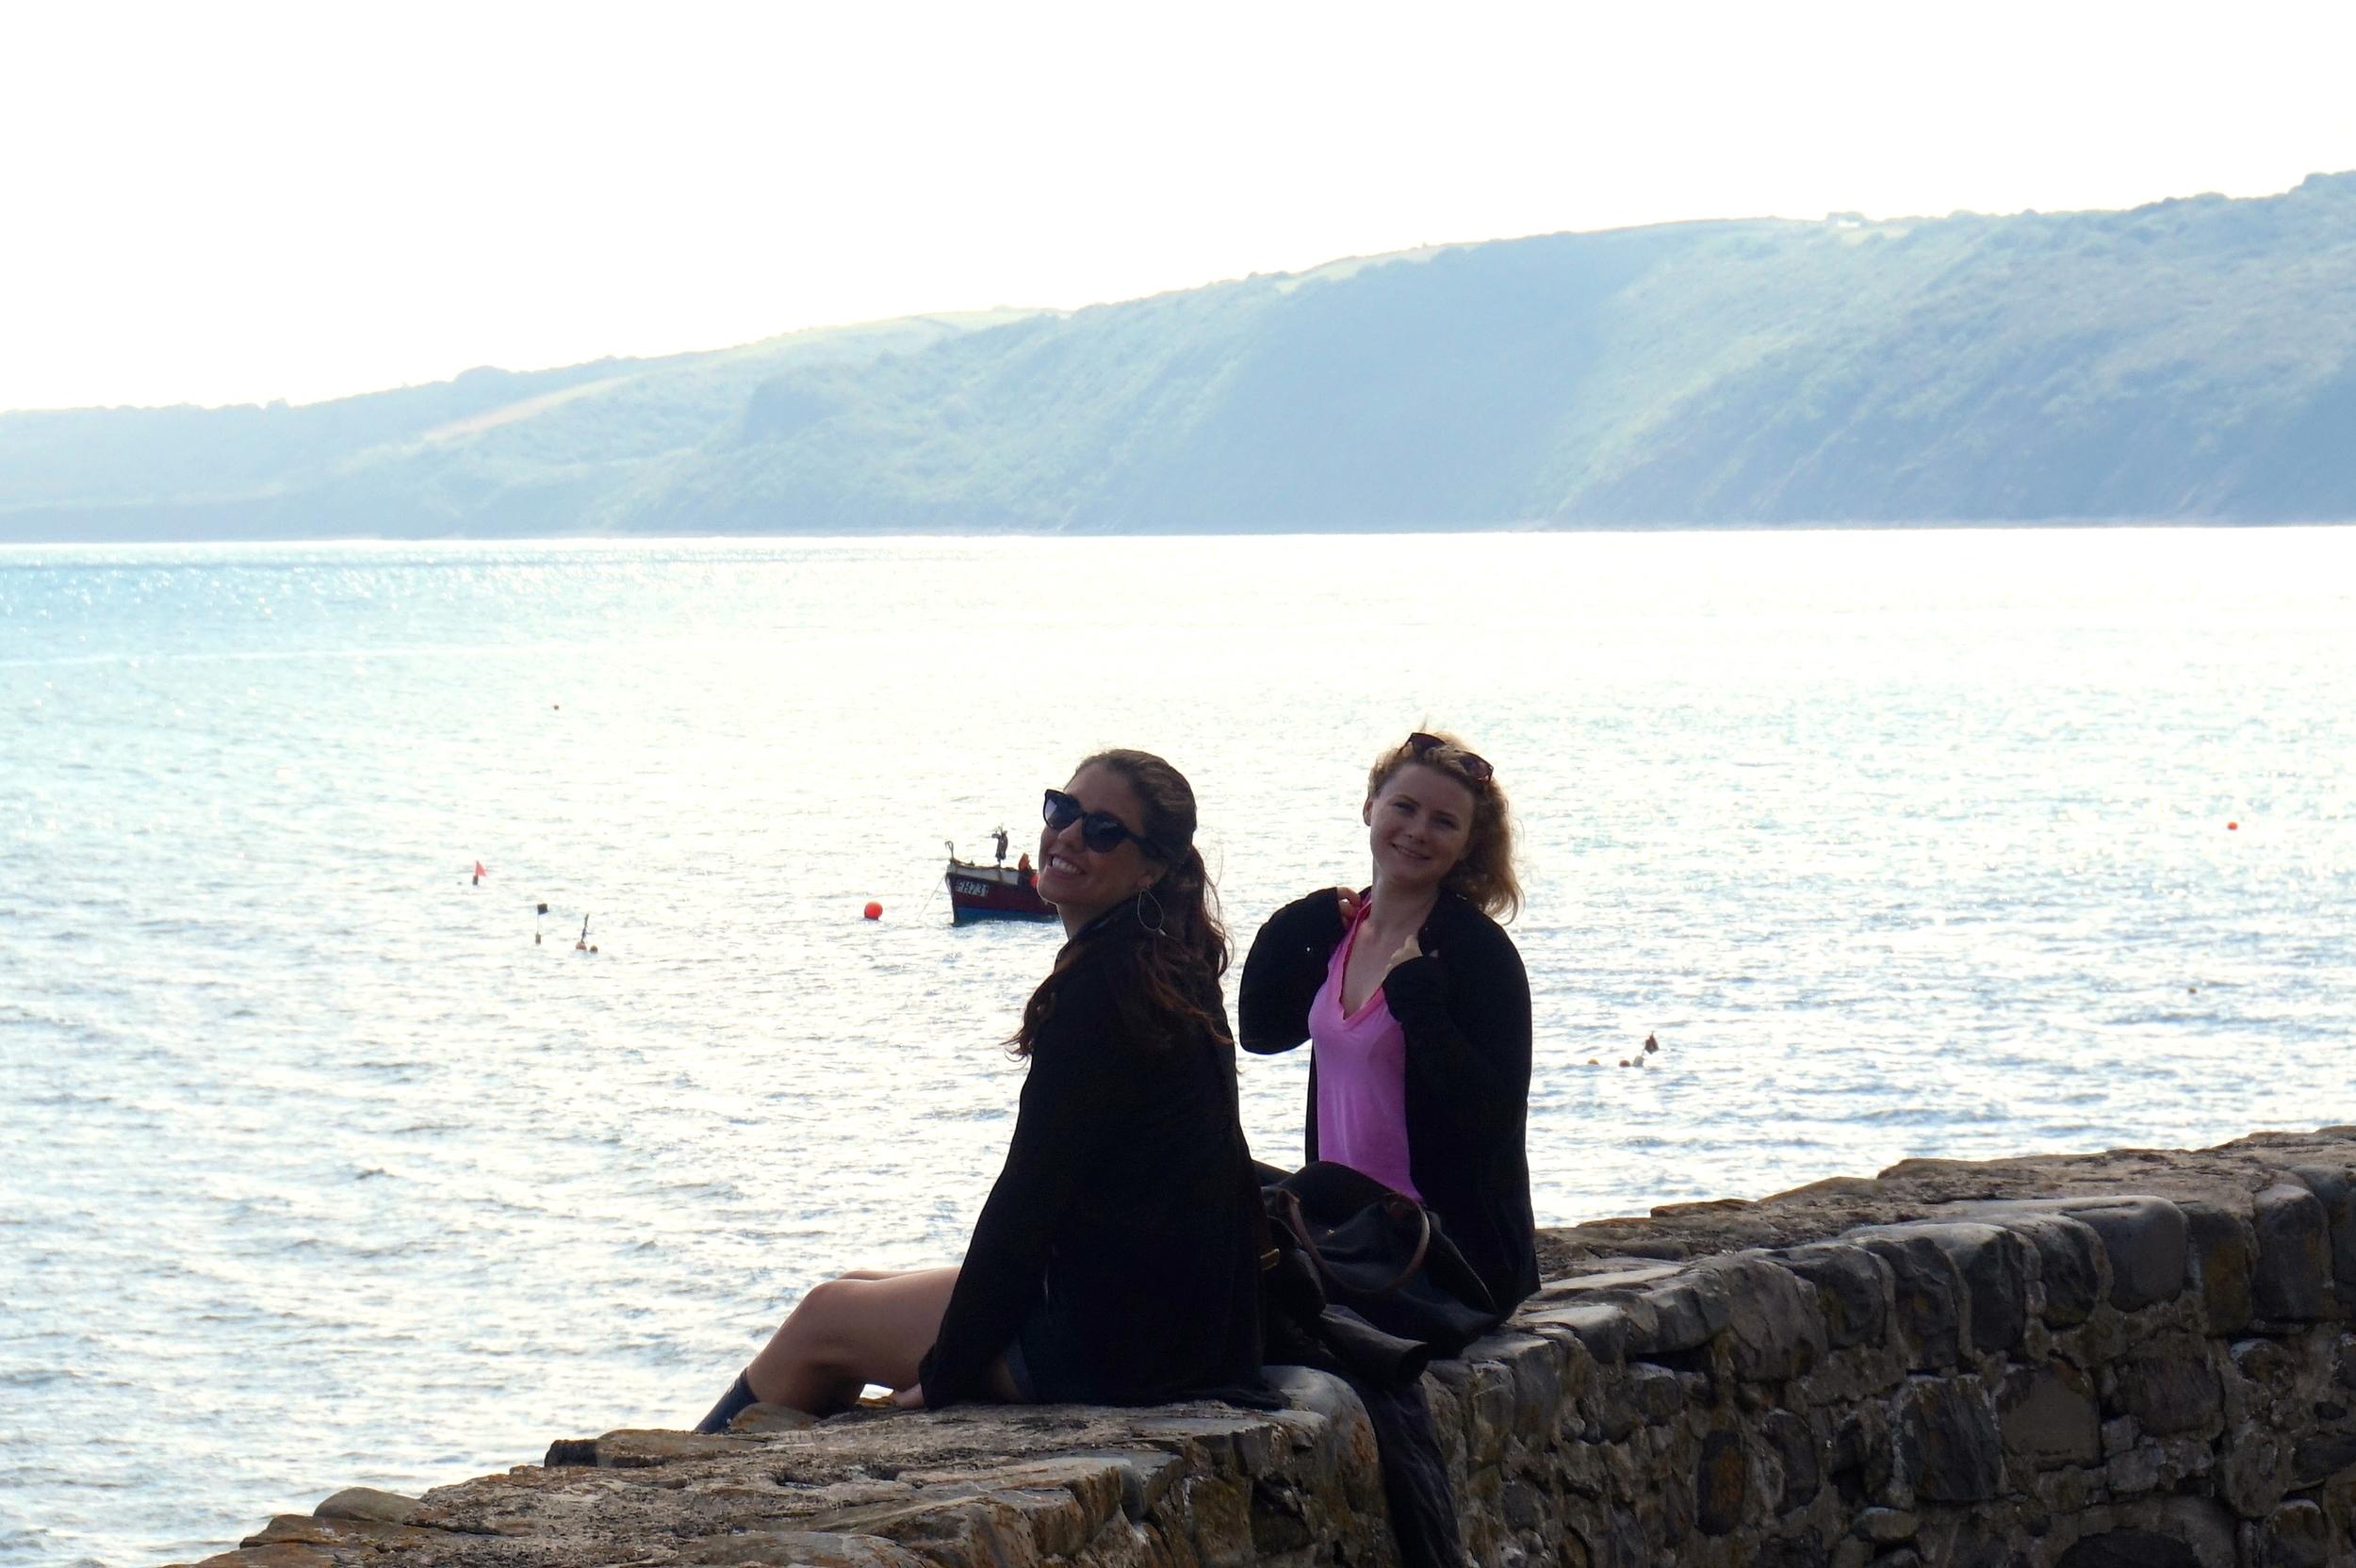 Chloe and Hannah hopped on the ledge